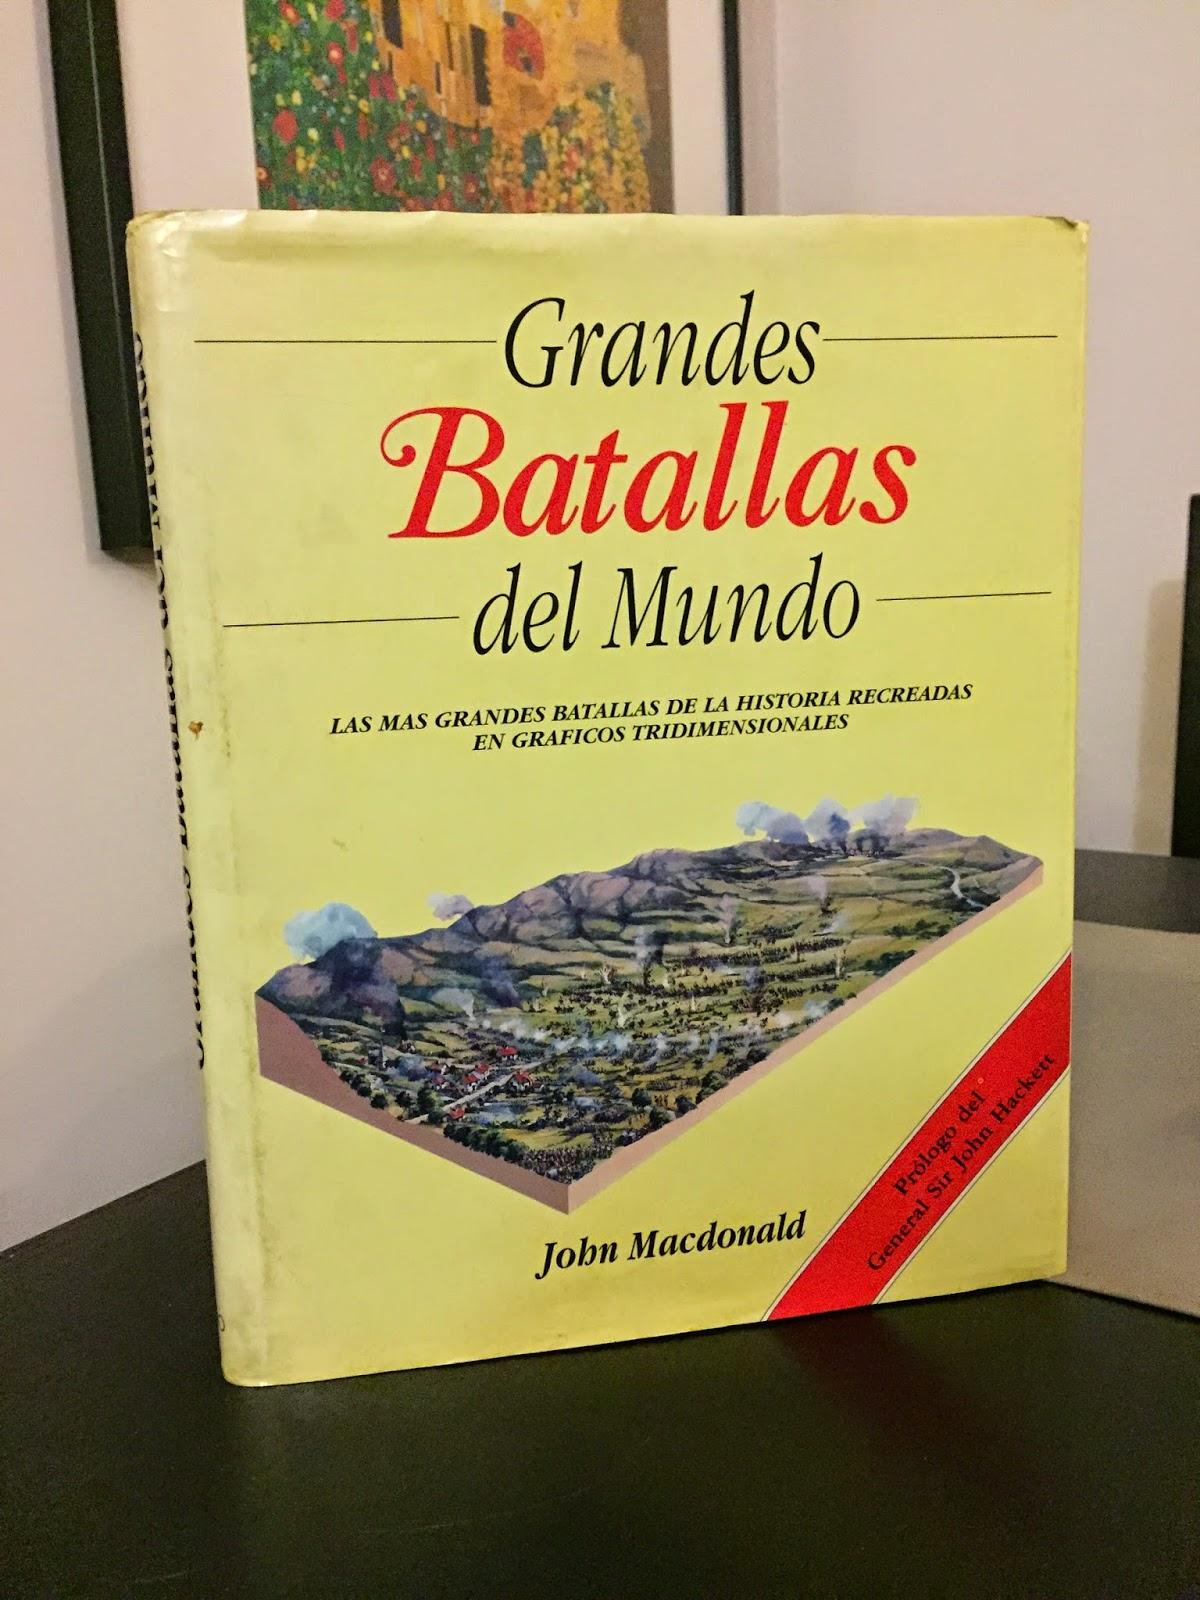 Grandes Batallas del Mundo, John Macdonald, Segunda Guerra Mundial